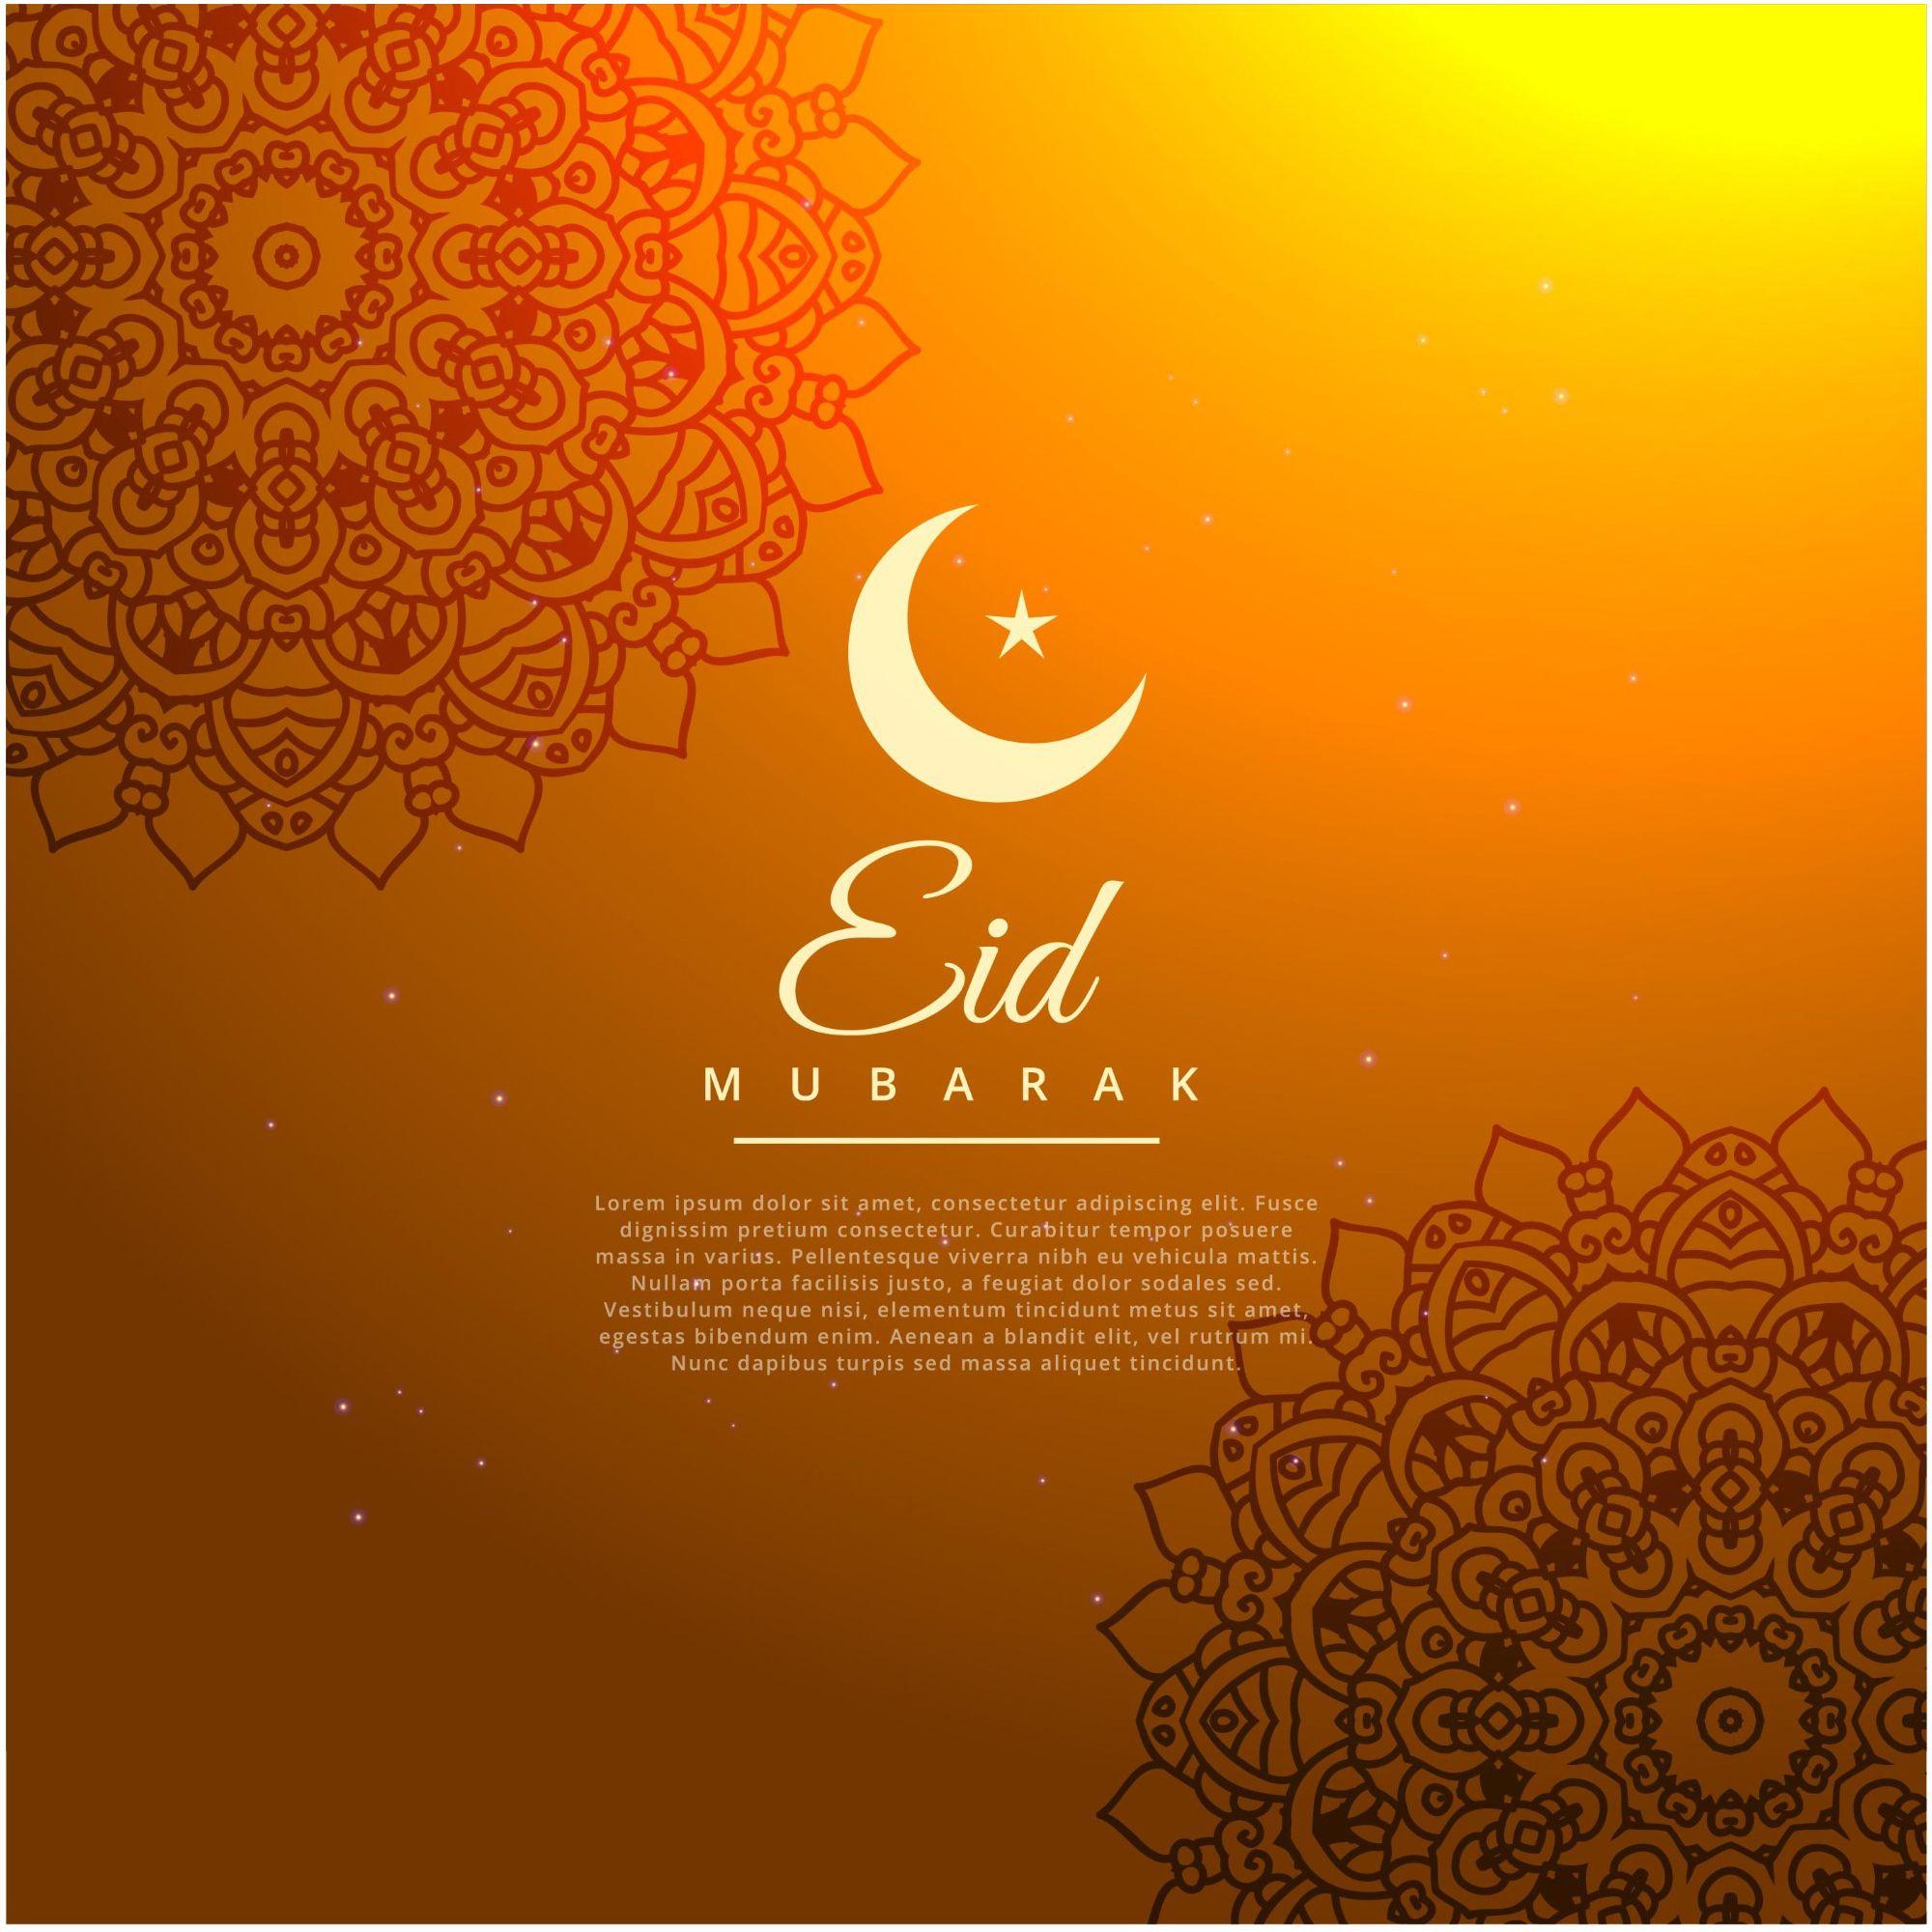 Eid mubarak orange color background wallpaper vector httpwww eid greeting cards kristyandbryce Images